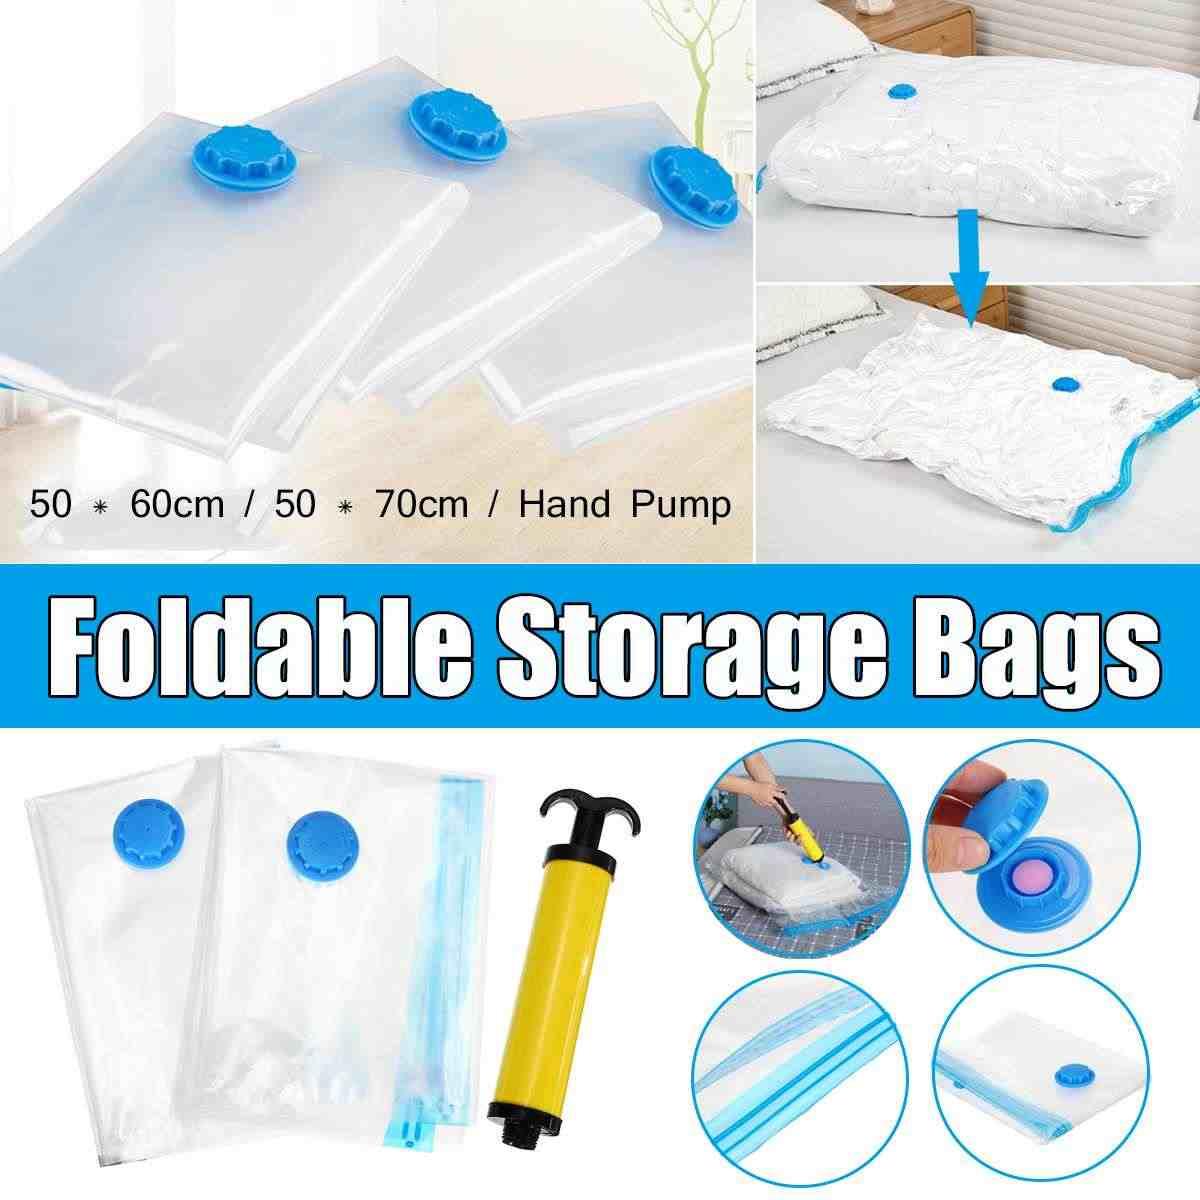 Hand Pump Vacuum Space Saver Saving Storage Bags+Seal Compressed Organizer Bag